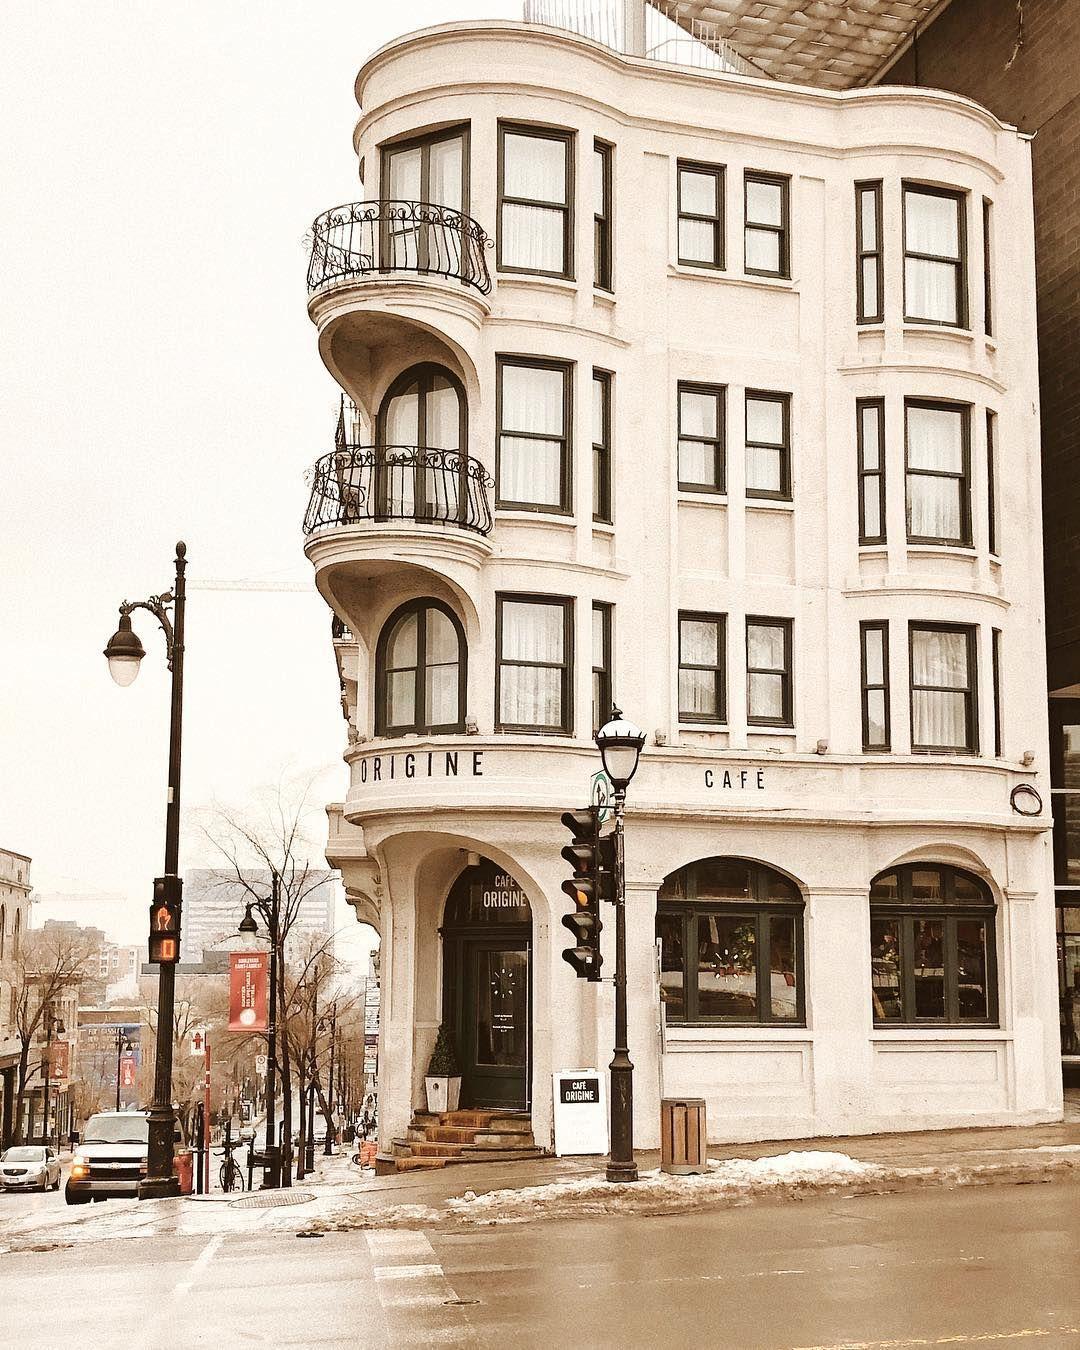 Cafe Origine Street Corner In 2020 Cafe Exterior City Design Coffee Shop Aesthetic